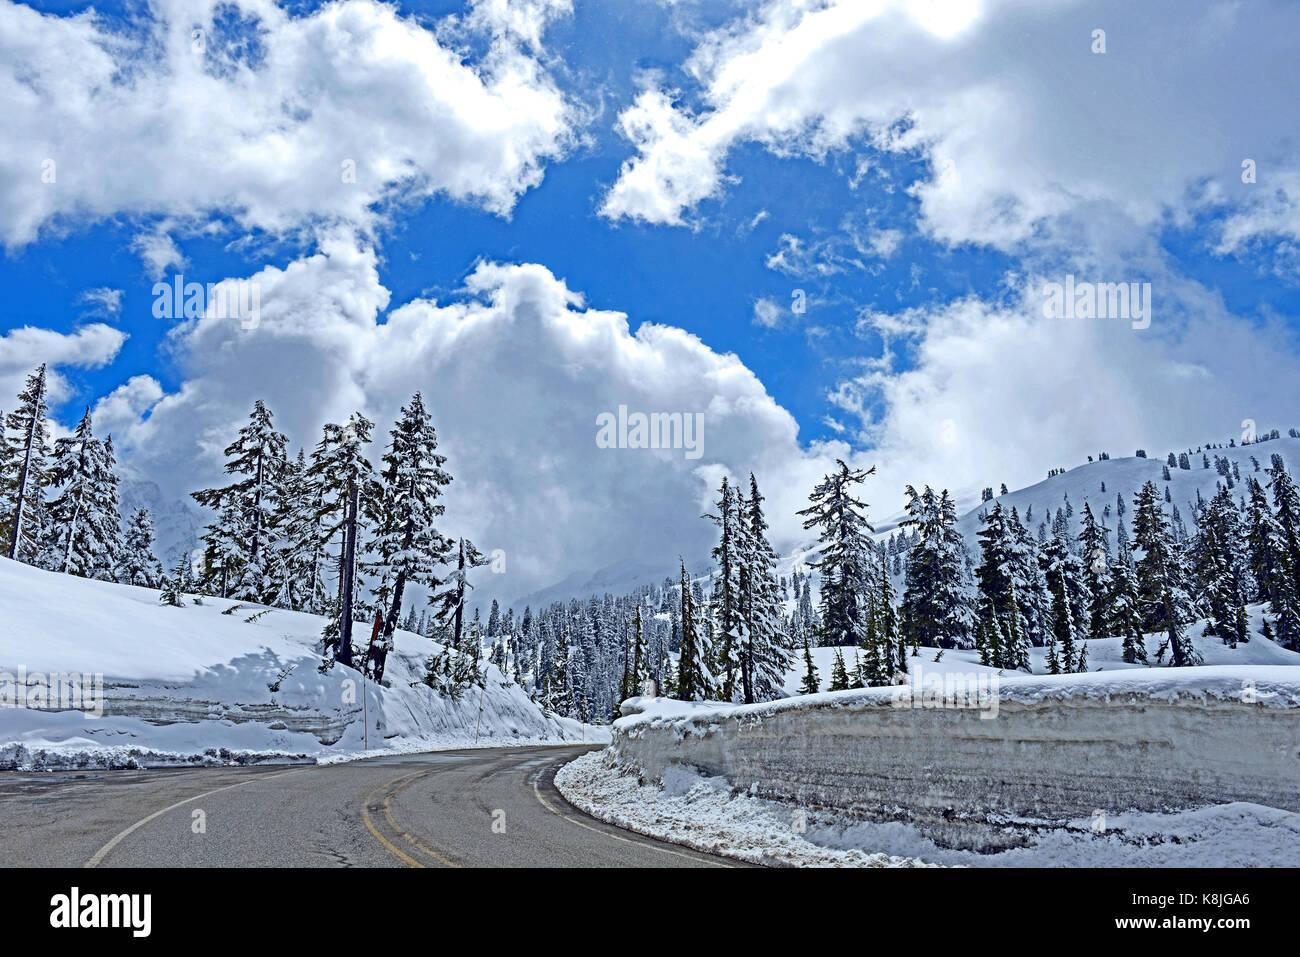 Wild and Scenic Washington State, USA - Stock Image